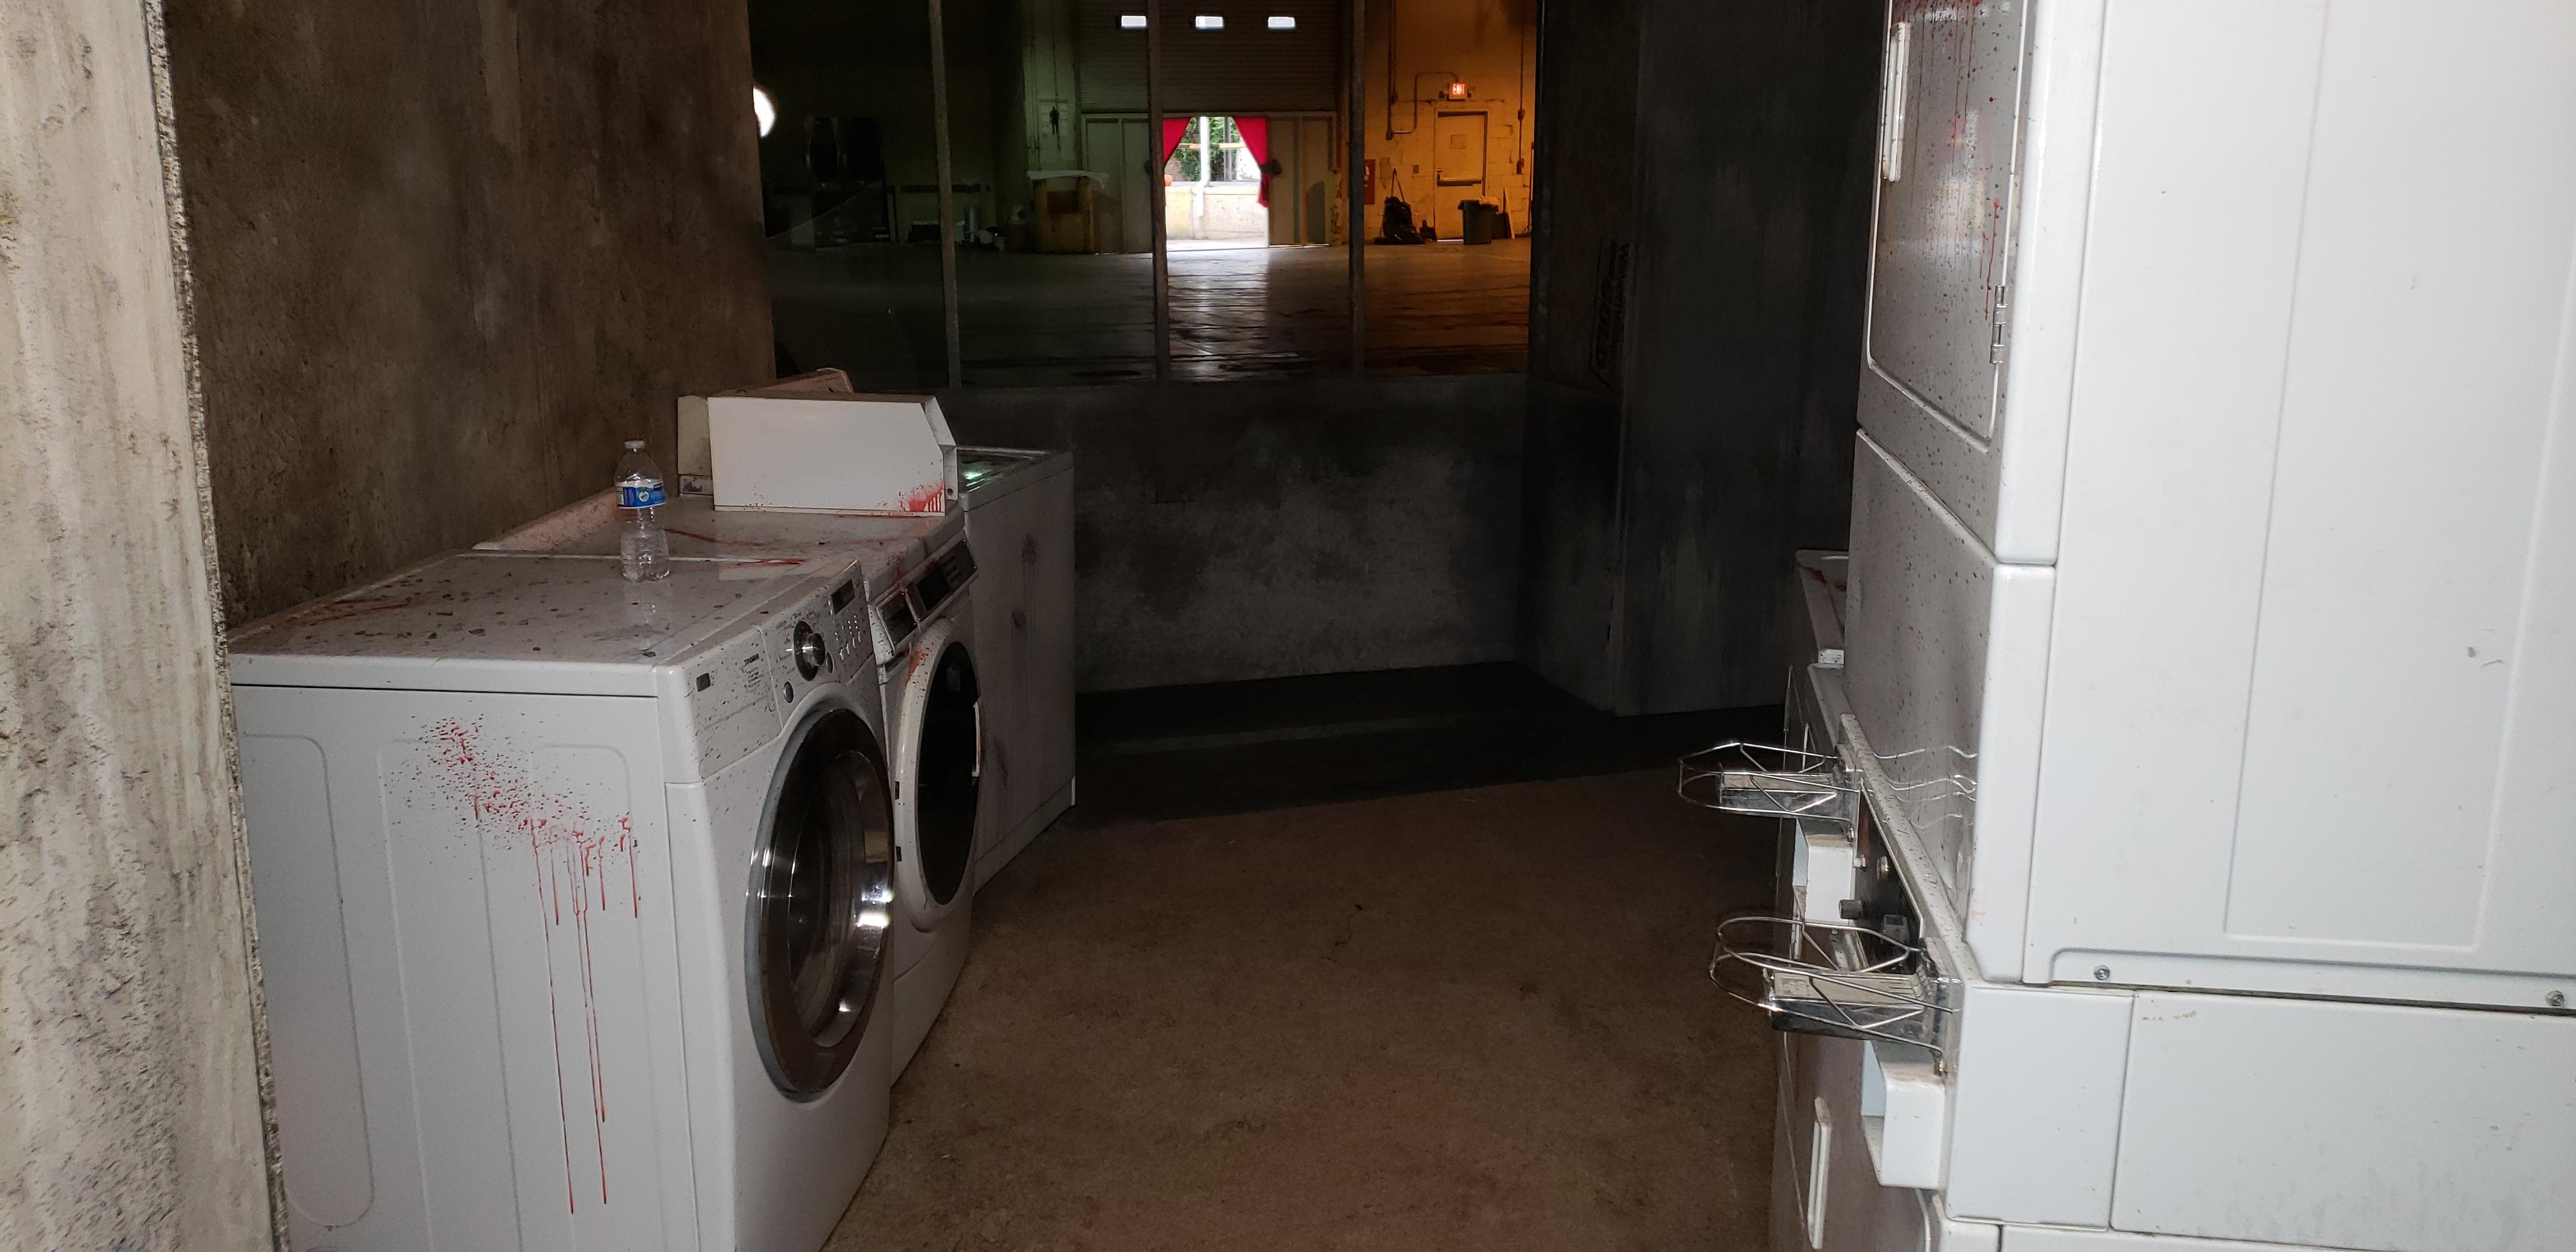 21 4 Laundromat